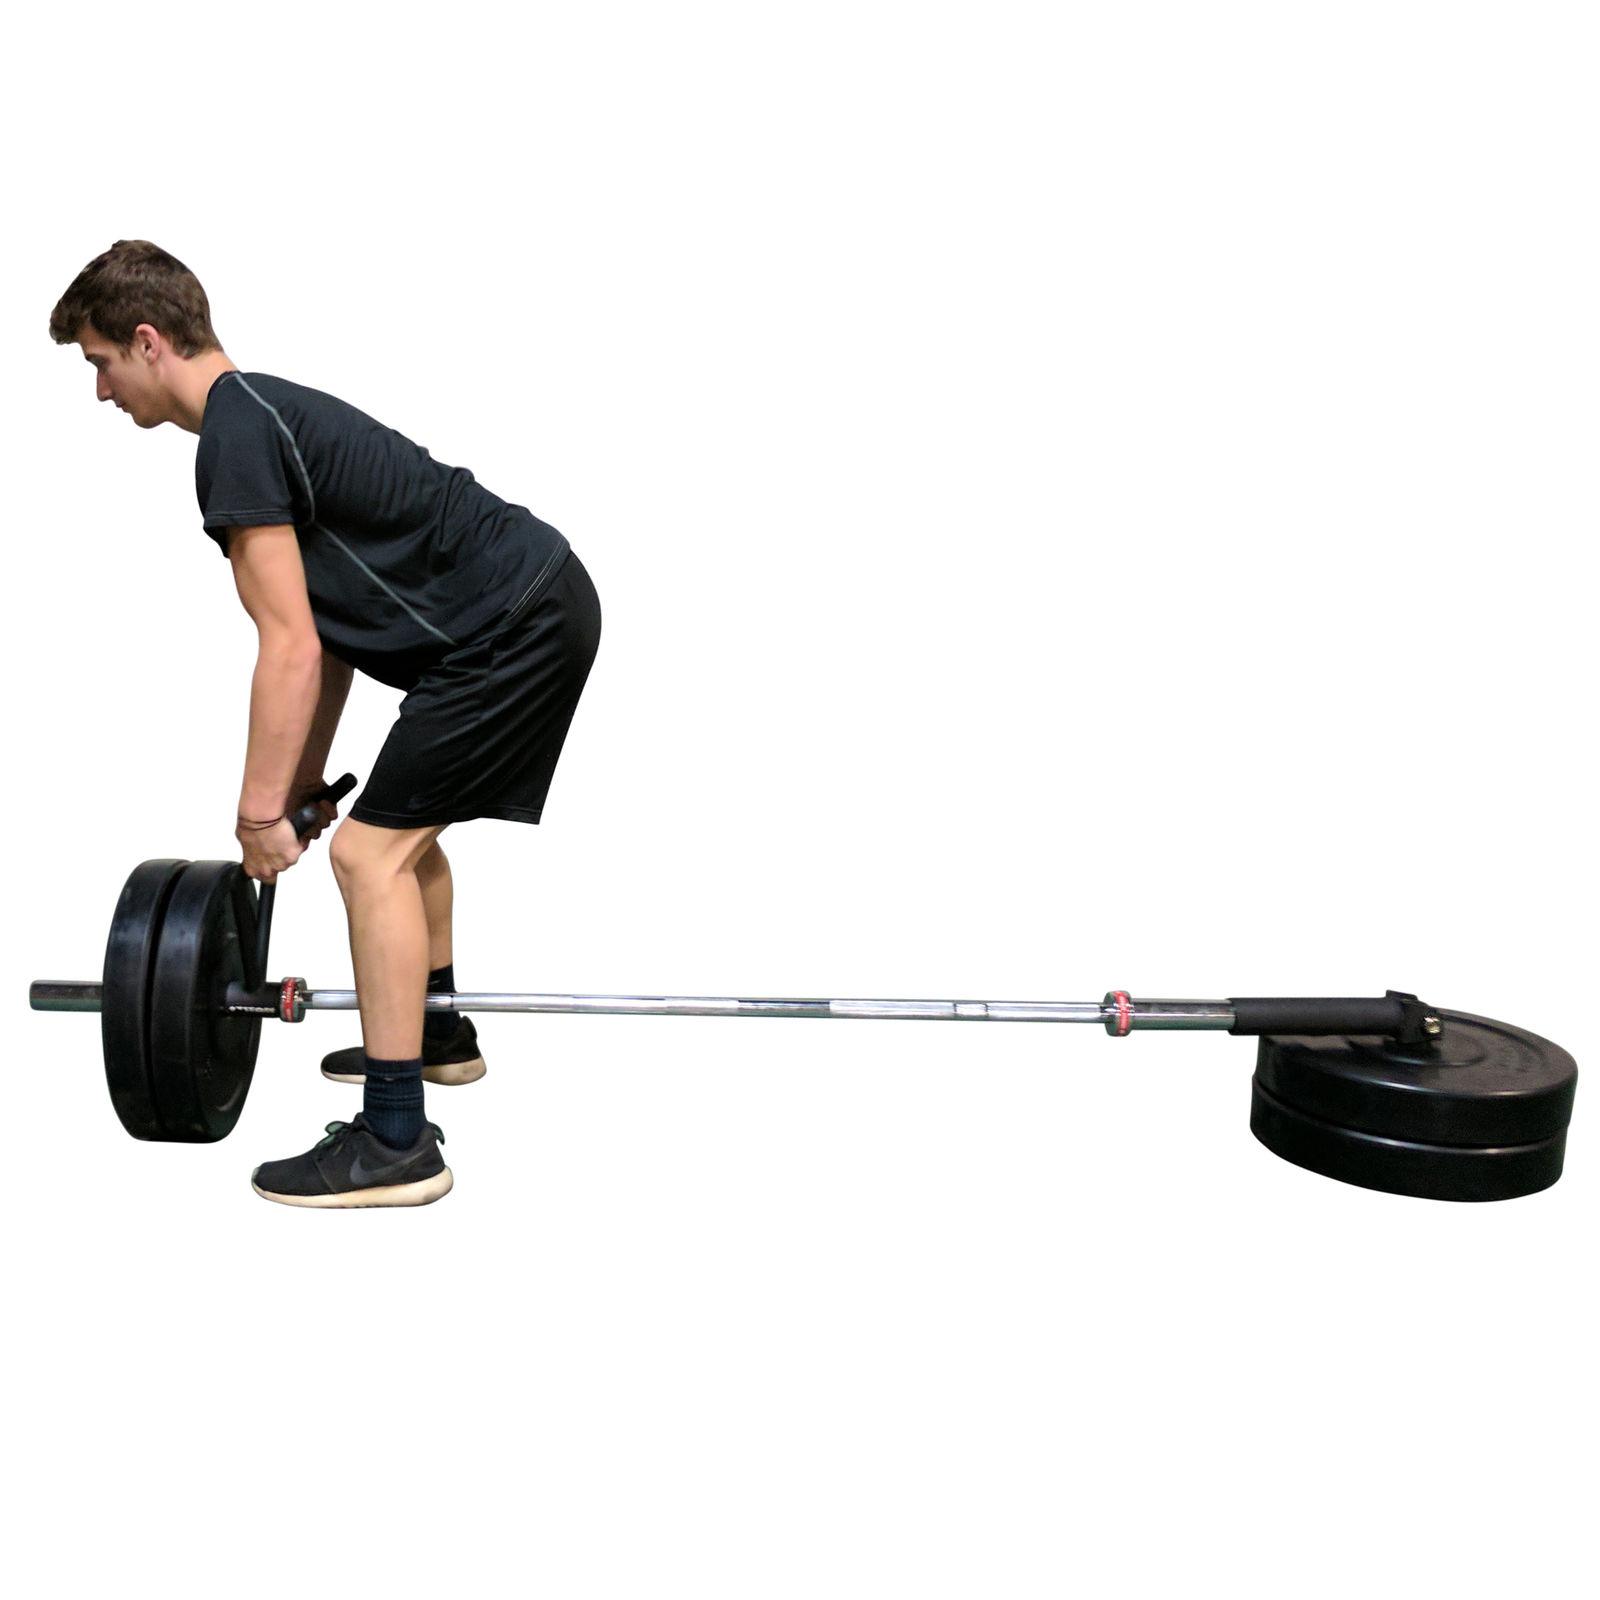 1600x1600 Titan Angled Landmine Handle W Rubber Grip Olympic Barbell Ebay